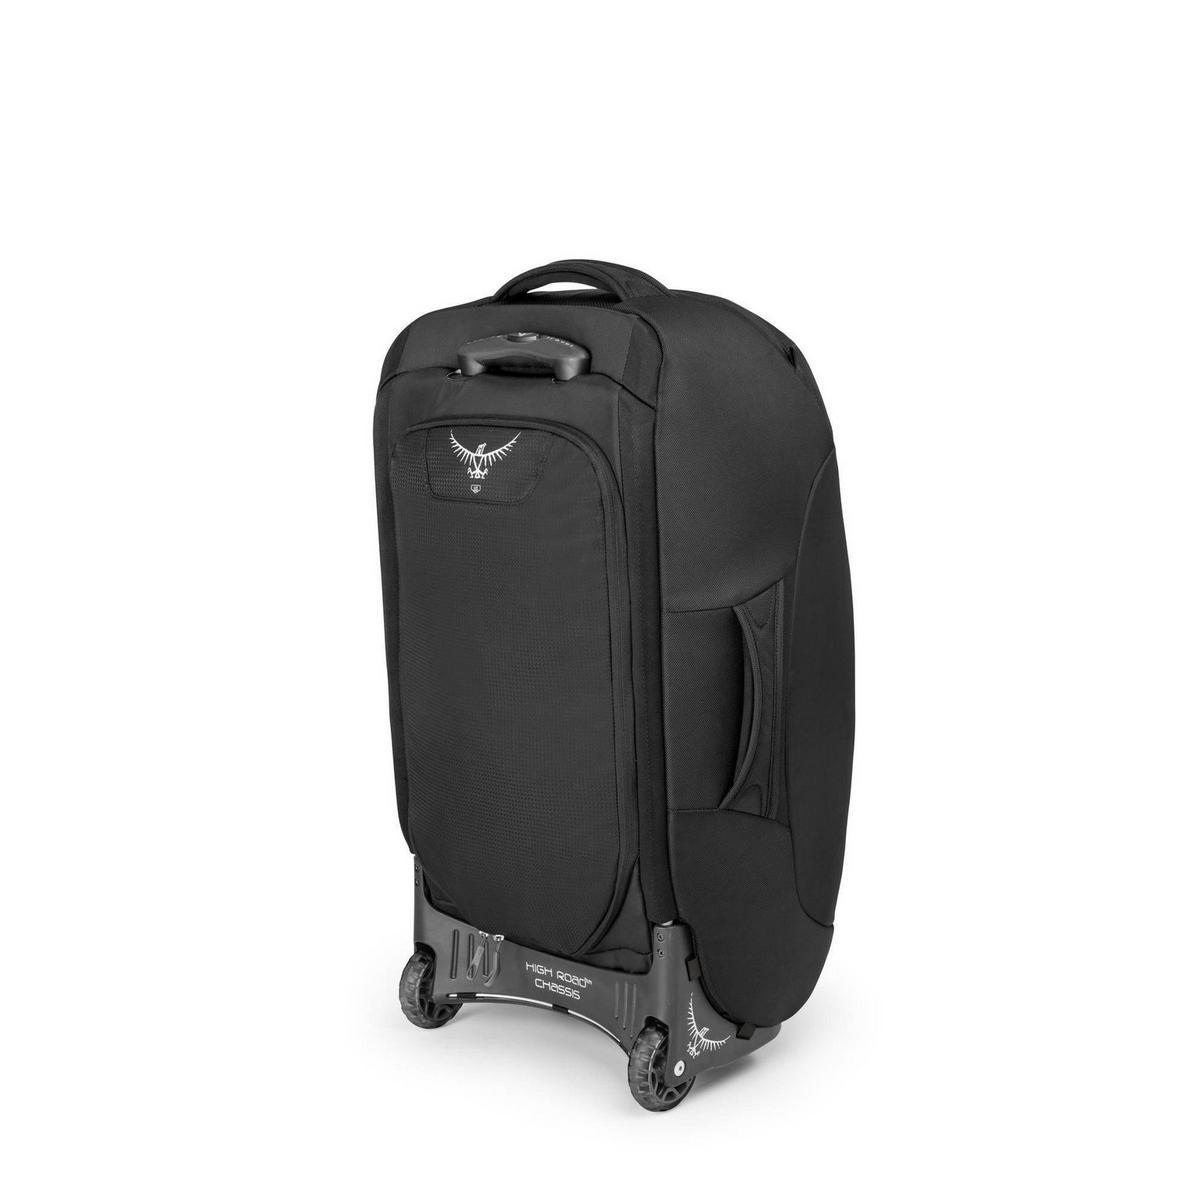 Osprey Sojourn 80 Wheeled Case